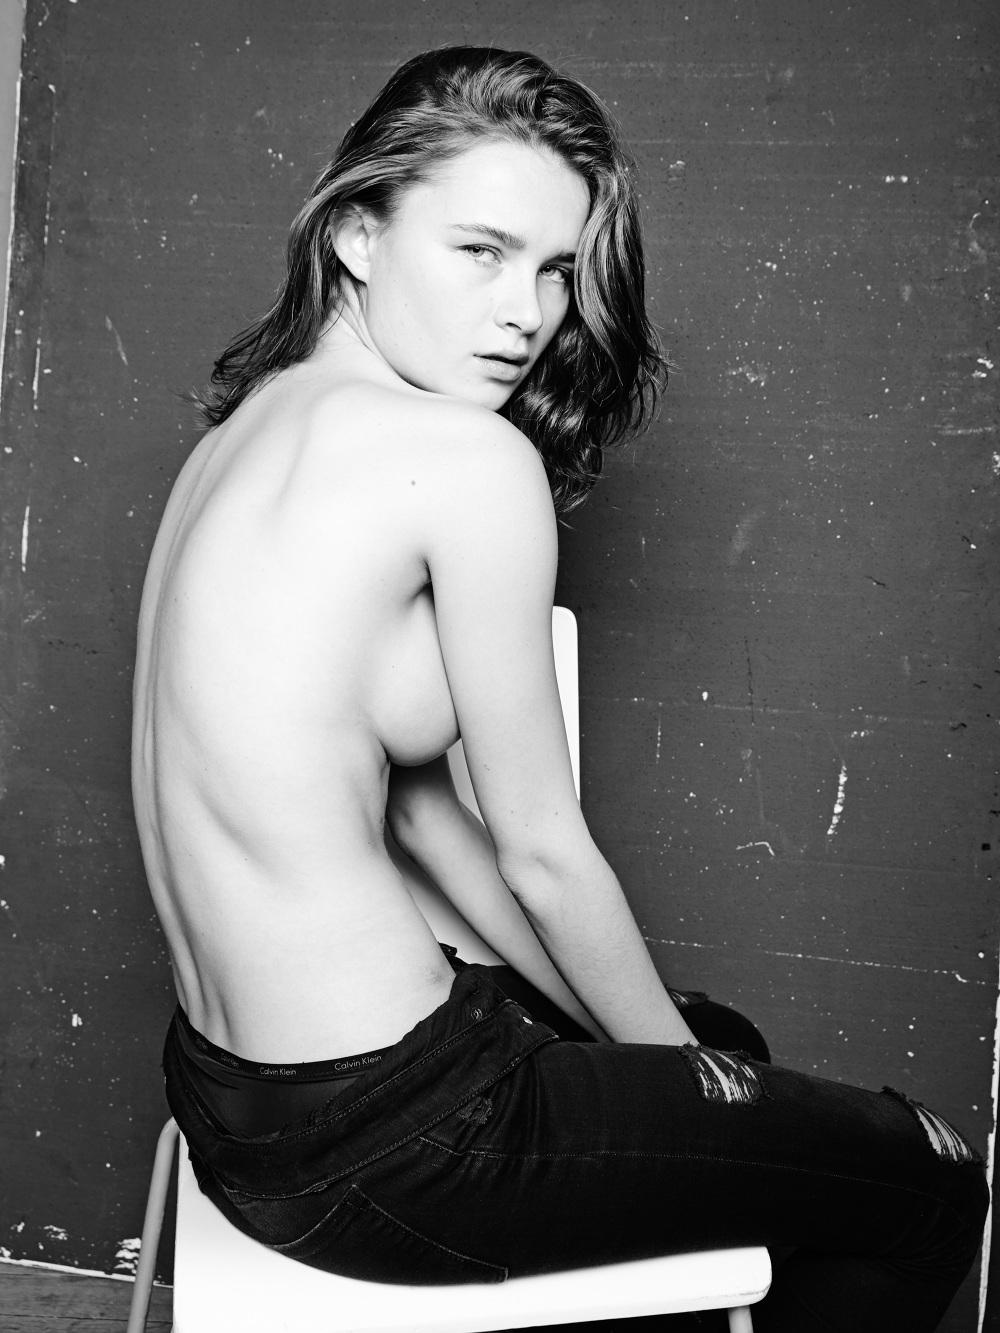 Images Anastasiya Primak nudes (34 foto and video), Ass, Bikini, Instagram, braless 2015